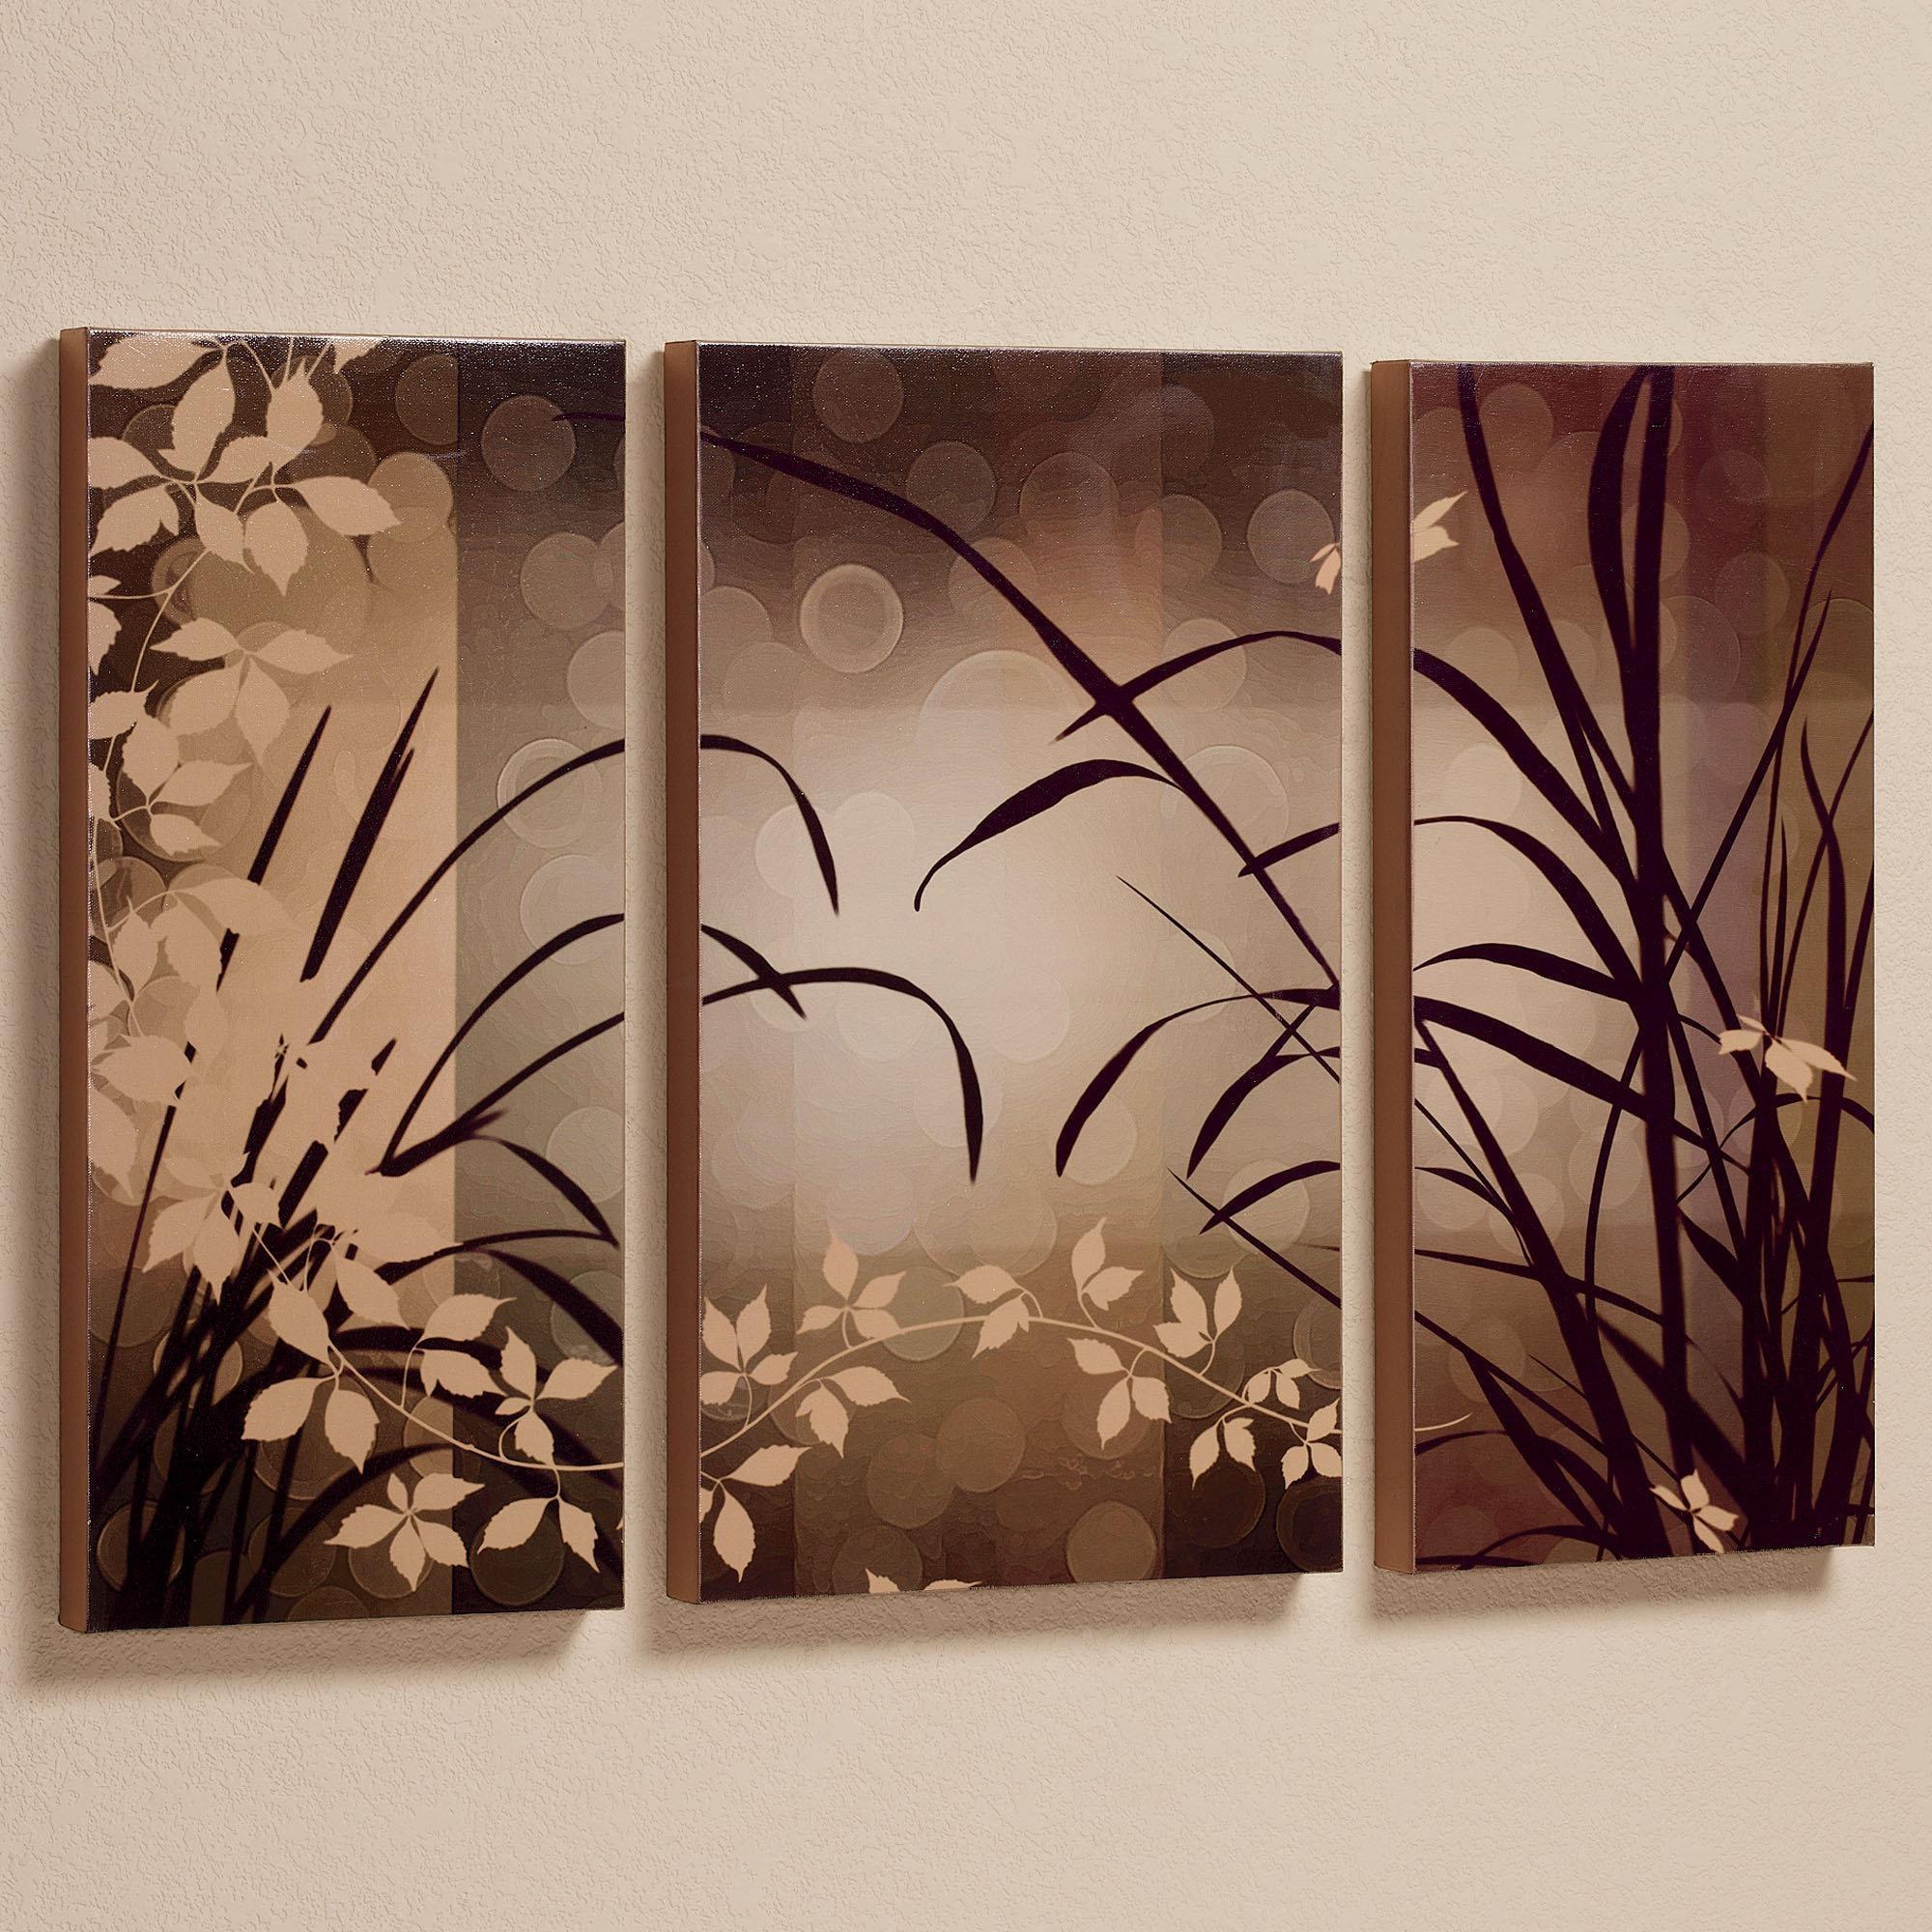 Wall Art: Amazing Canvas Art Set Framed Wall Art Set Of 2, 5 Piece For Matching Canvas Wall Art (Image 18 of 20)